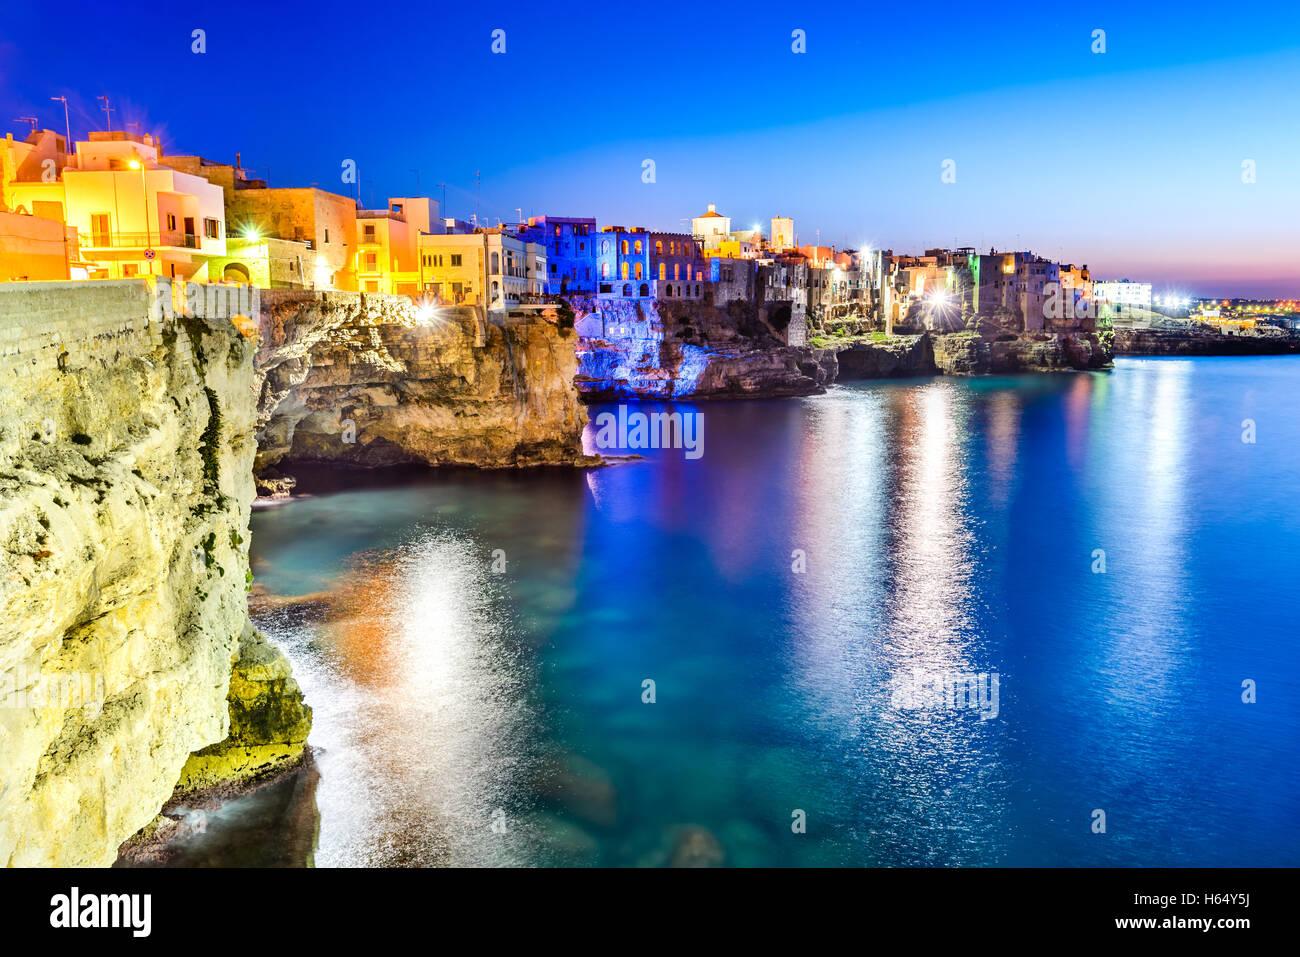 Puglia, Italy. Sunset scenery of Polignano a Mare, town in the province of Bari, Apulia, southern Italia on the - Stock Image